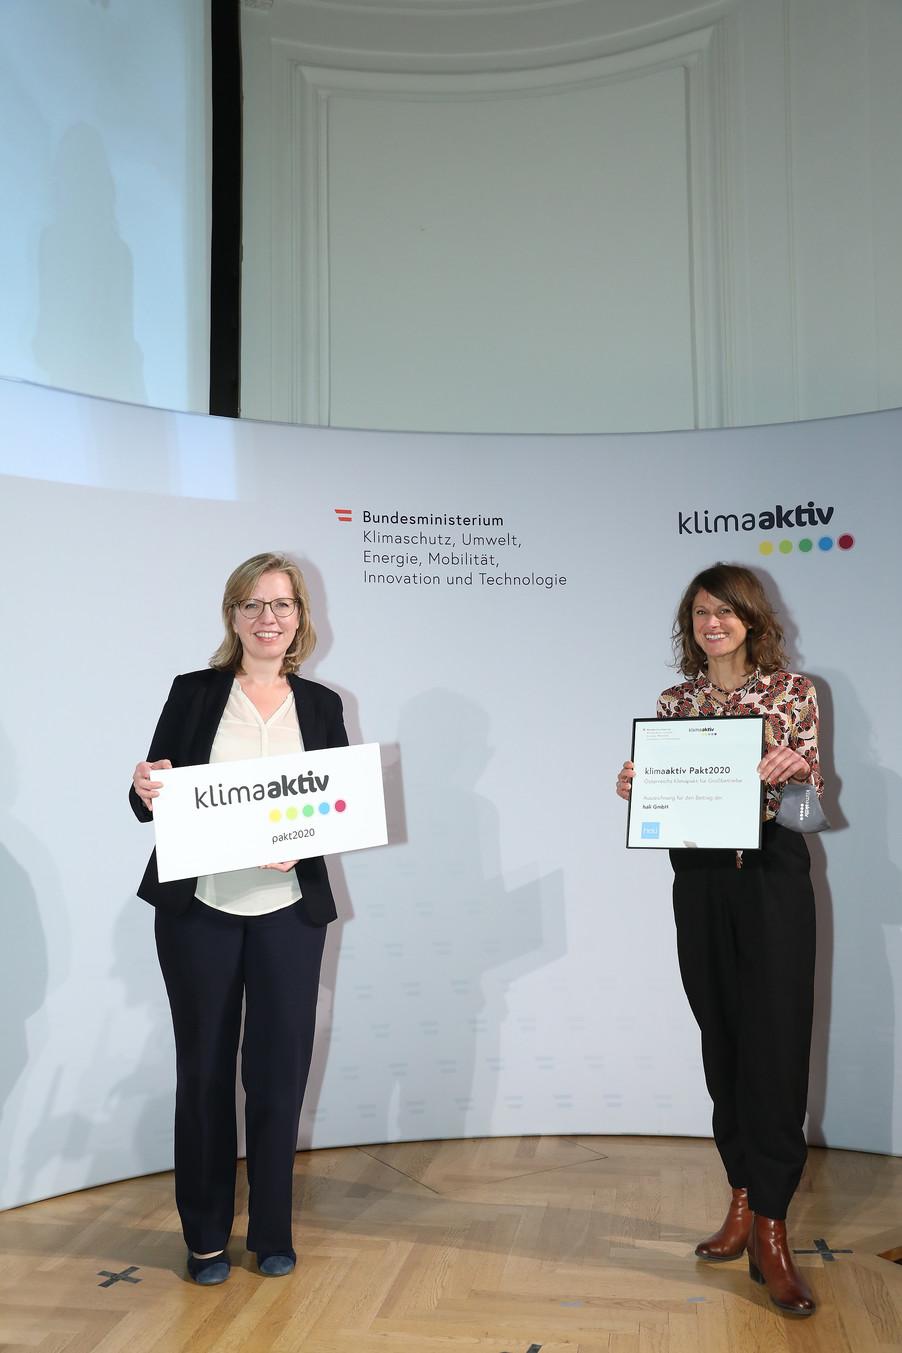 Bild 12 | klimaaktiv Dialog 2020